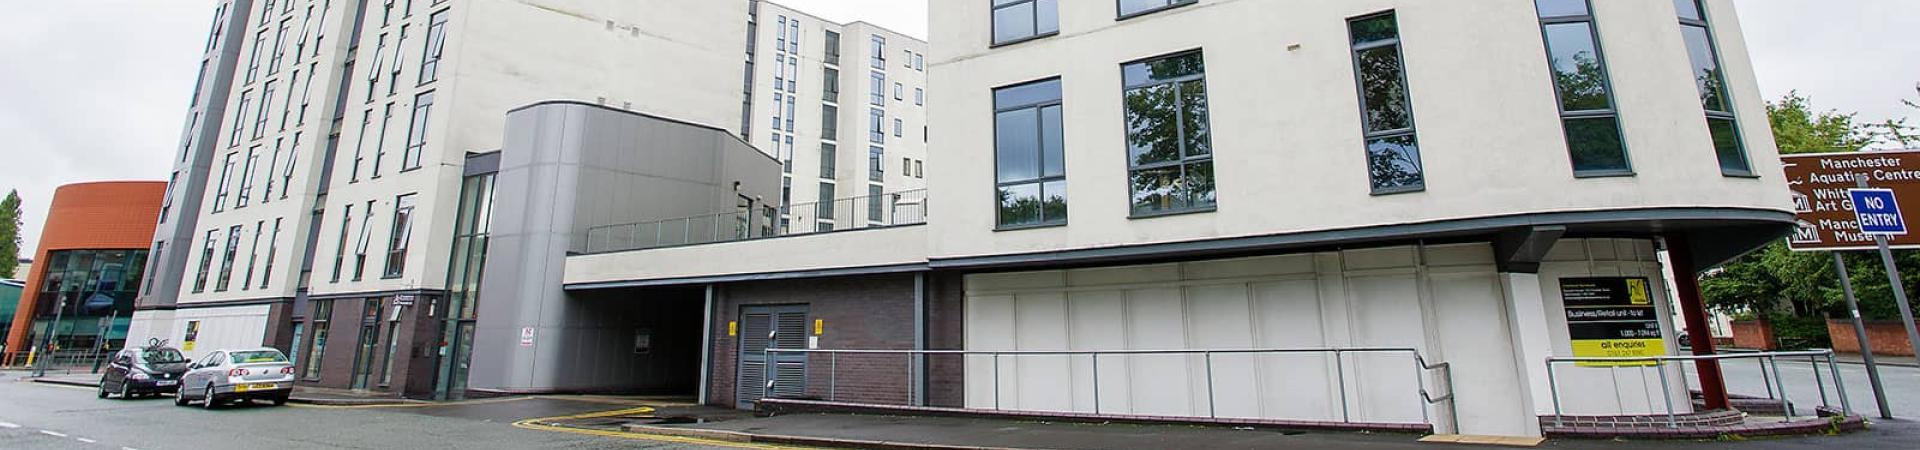 Grafton Street student accommodation, Manchester.